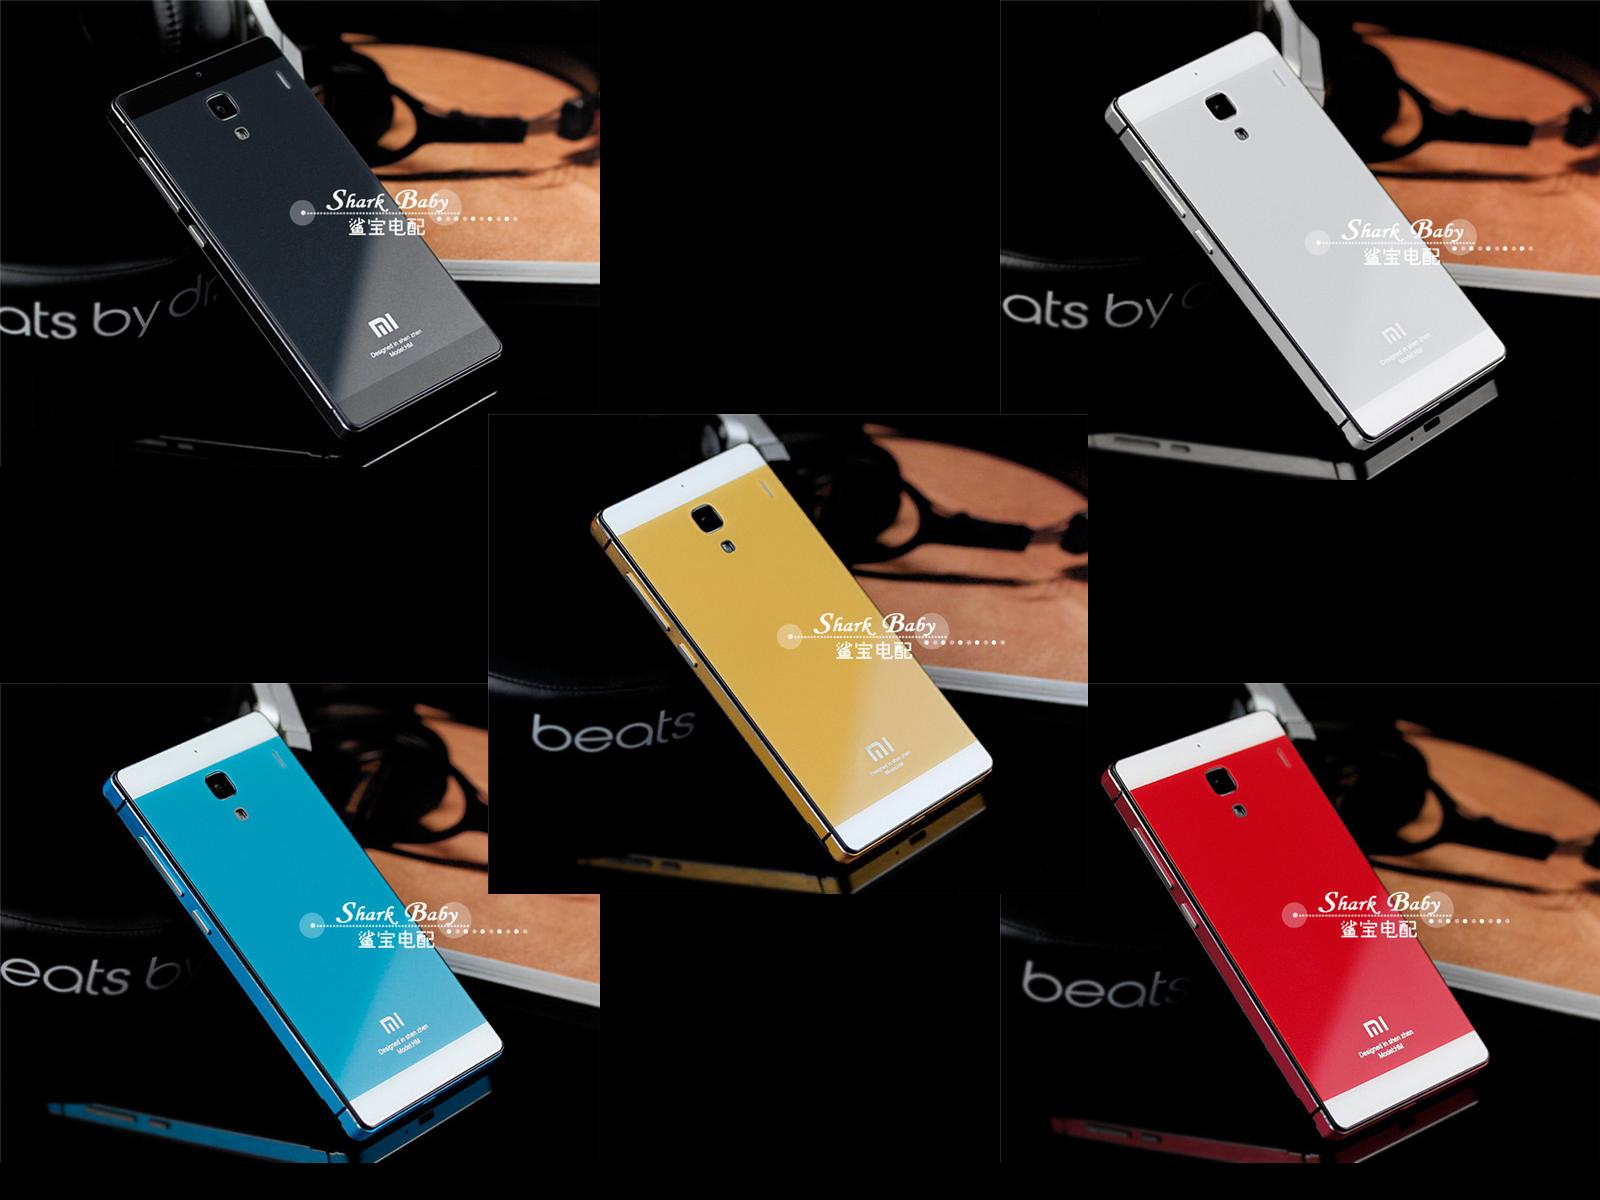 gl case xiaomi redmi 1s with Rumahcase Hardcase Slim Armor Hybrid Cocose Xiaomi Redmi 1s Note 4g Mi3 on Rumahcase hardcase Slim Armor Hybrid Cocose Xiaomi Redmi 1s Note 4g Mi3 together with